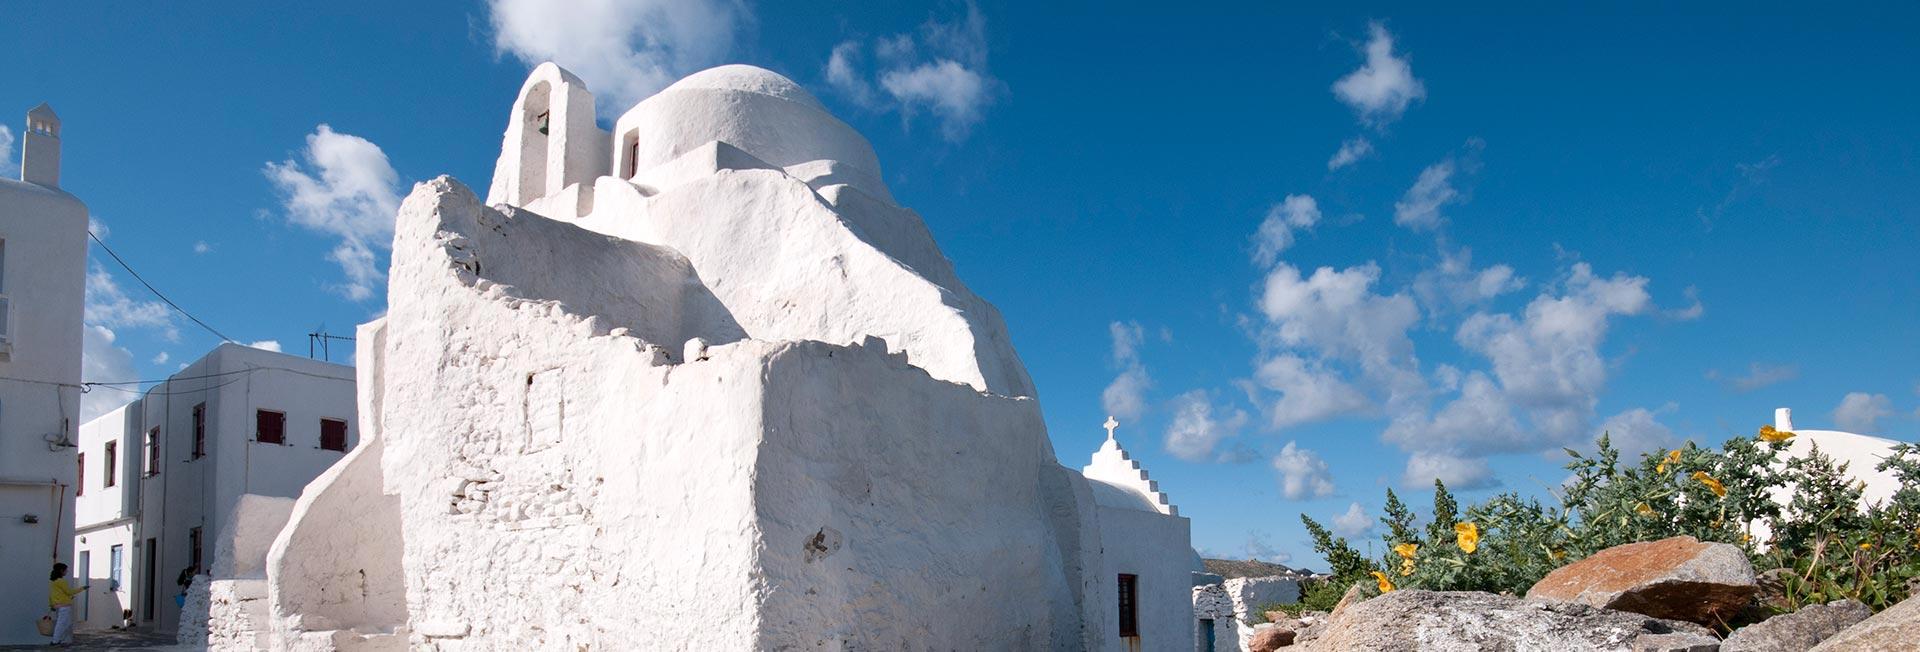 Lena's House - Mykonos Folklore Museum